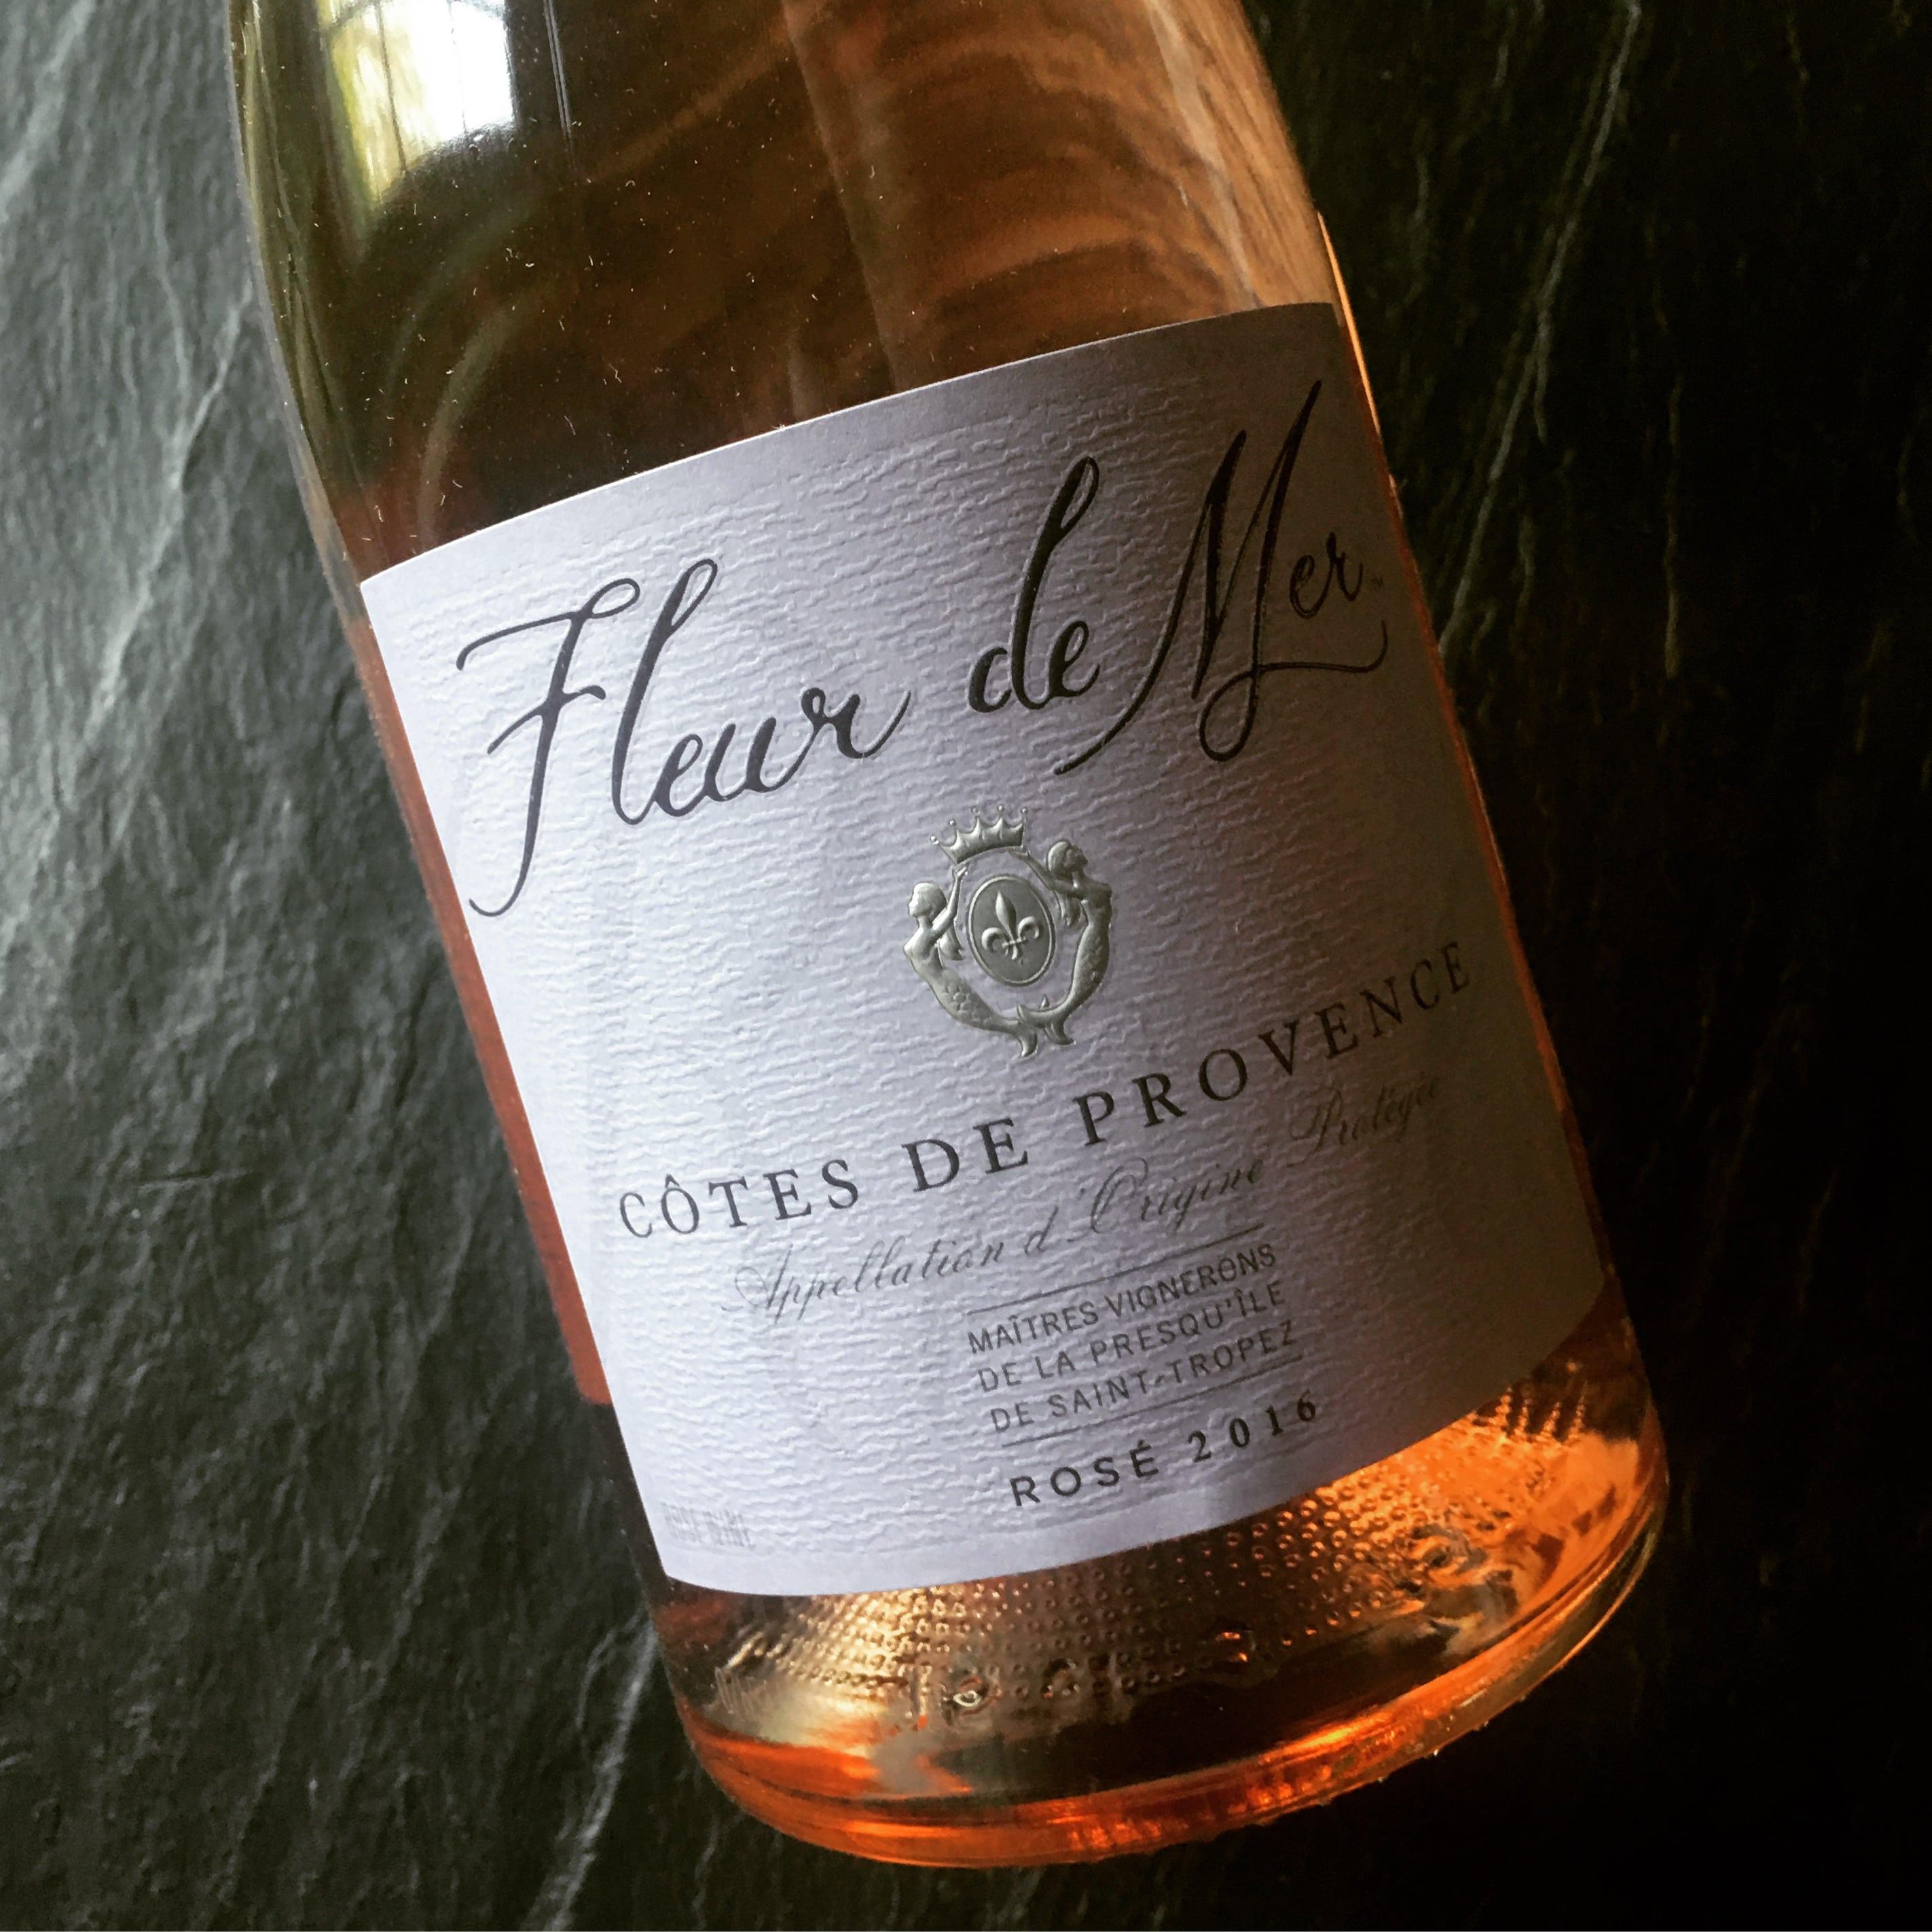 Fleur de Mer Côtes de Provence Rosé 2016